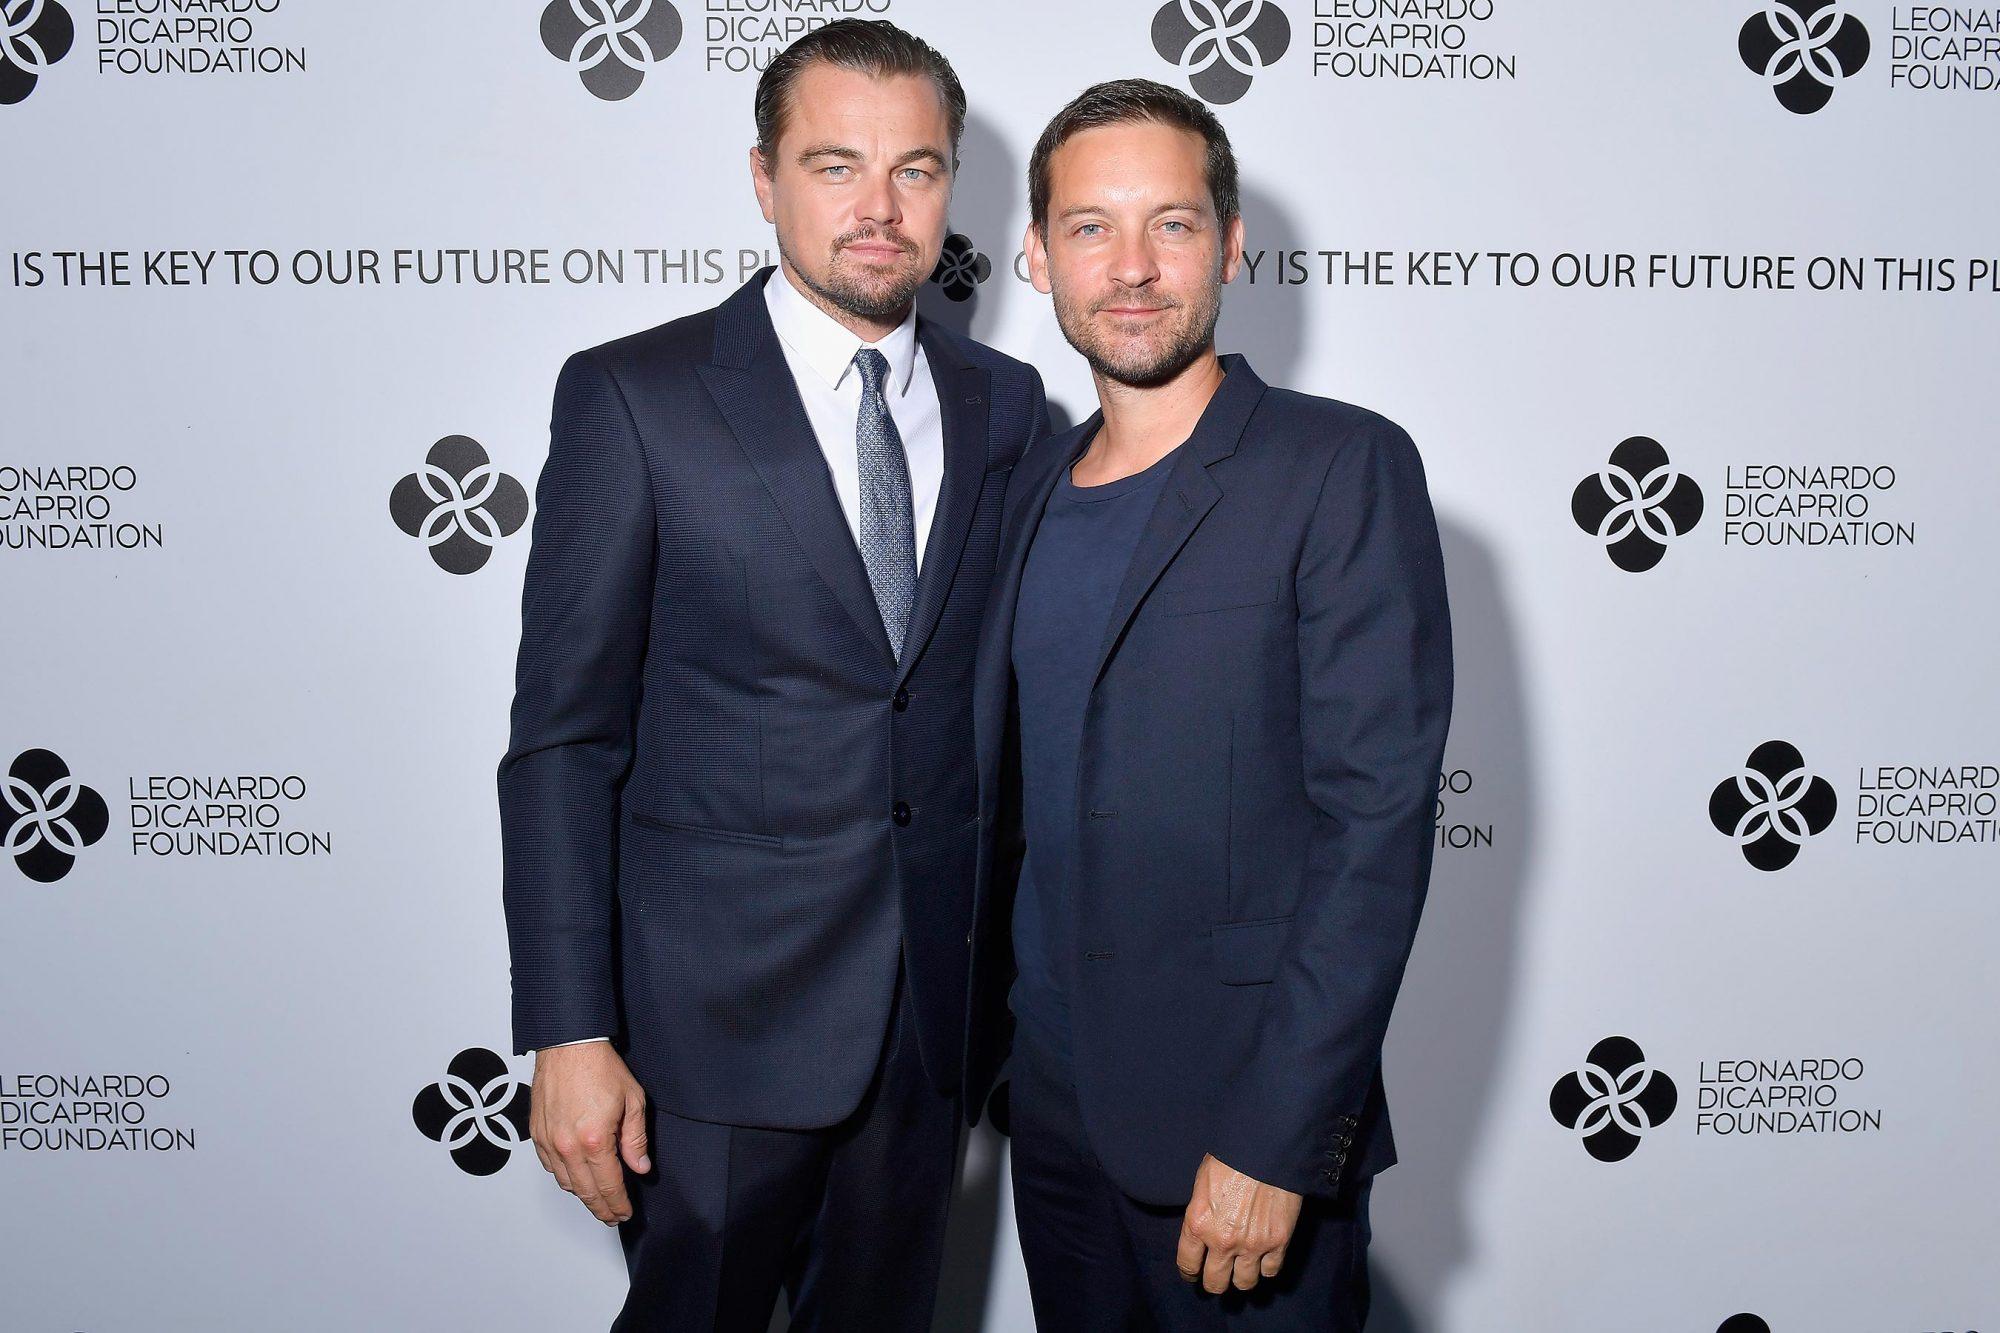 The Leonardo DiCaprio Foundation 4th Annual Saint-Tropez Gala - Cocktail reception